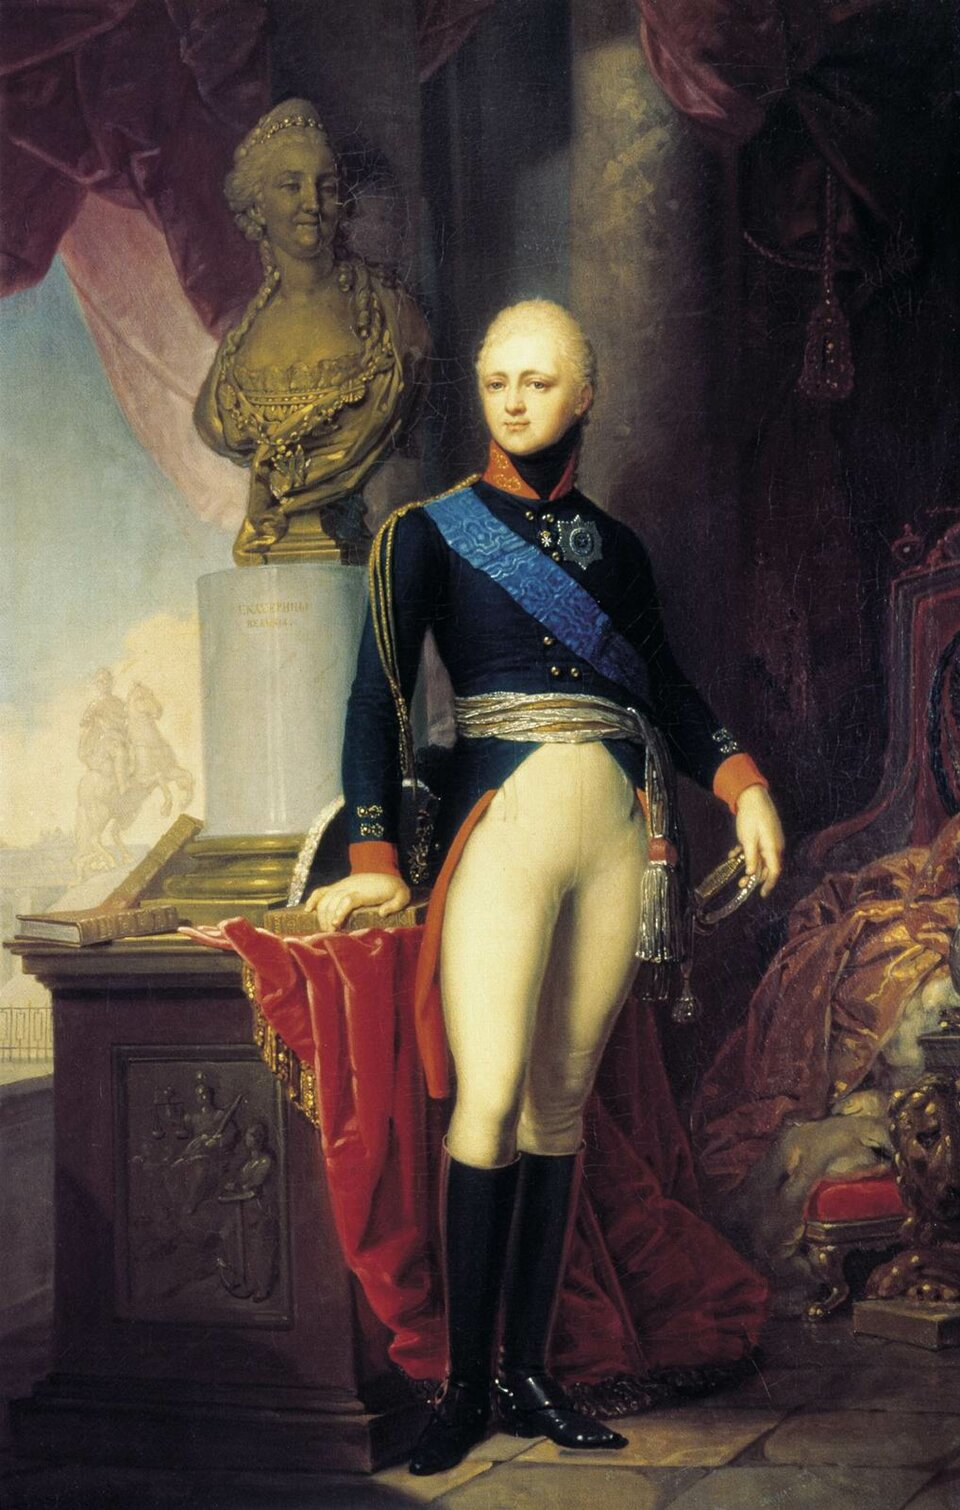 Car Aleksander IŹródło: Vladimir Borovikovsky, Car Aleksander I, 1800, domena publiczna.